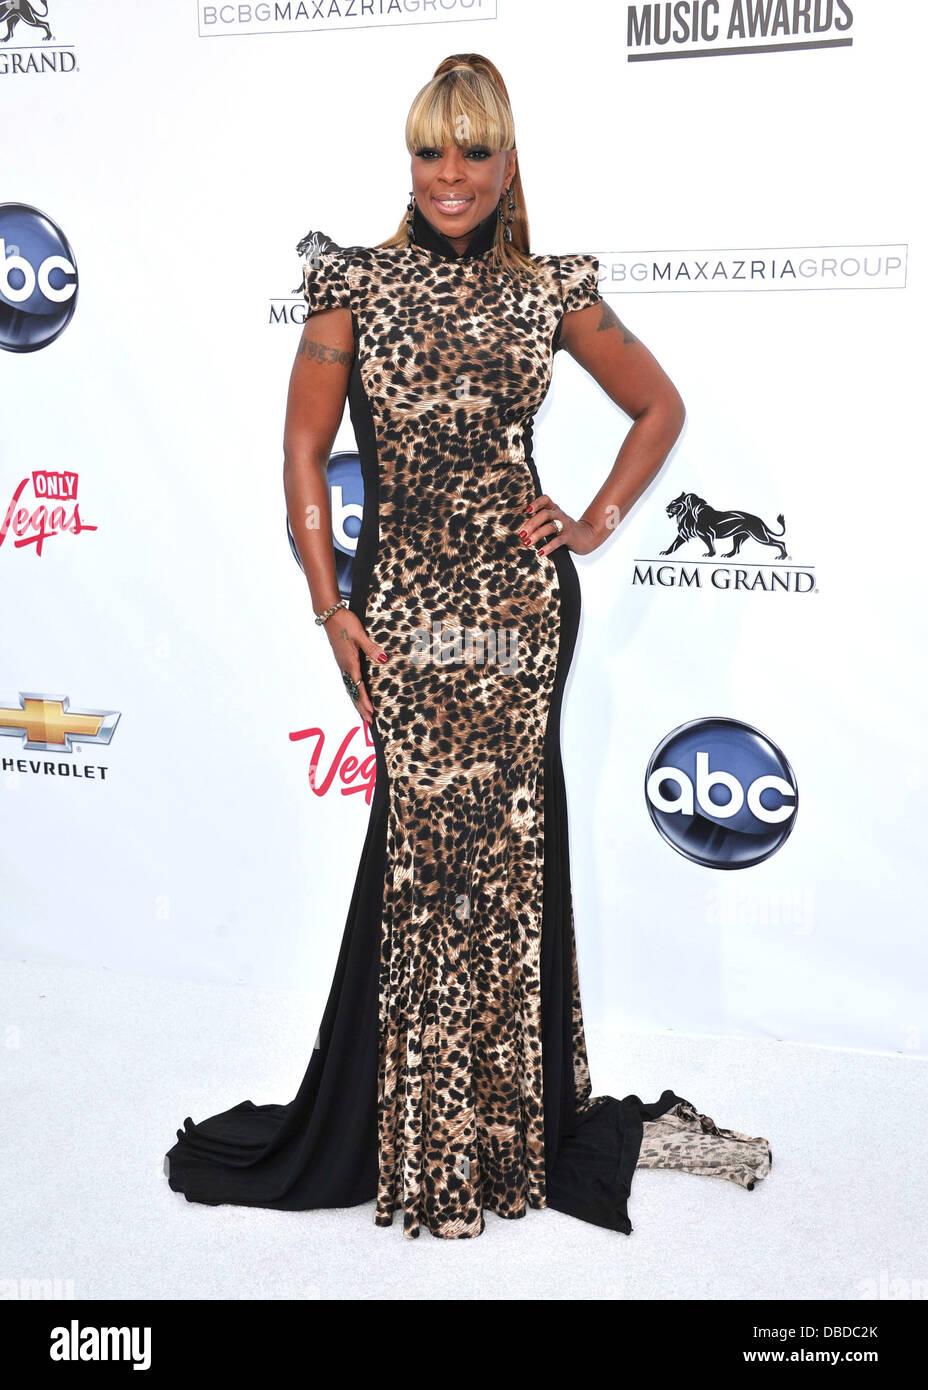 Mary J. Blige 2011 Billboard Music Awards at MGM Grand Garden Arena Las Vegas, Nevada - 22.05.11 - Stock Image